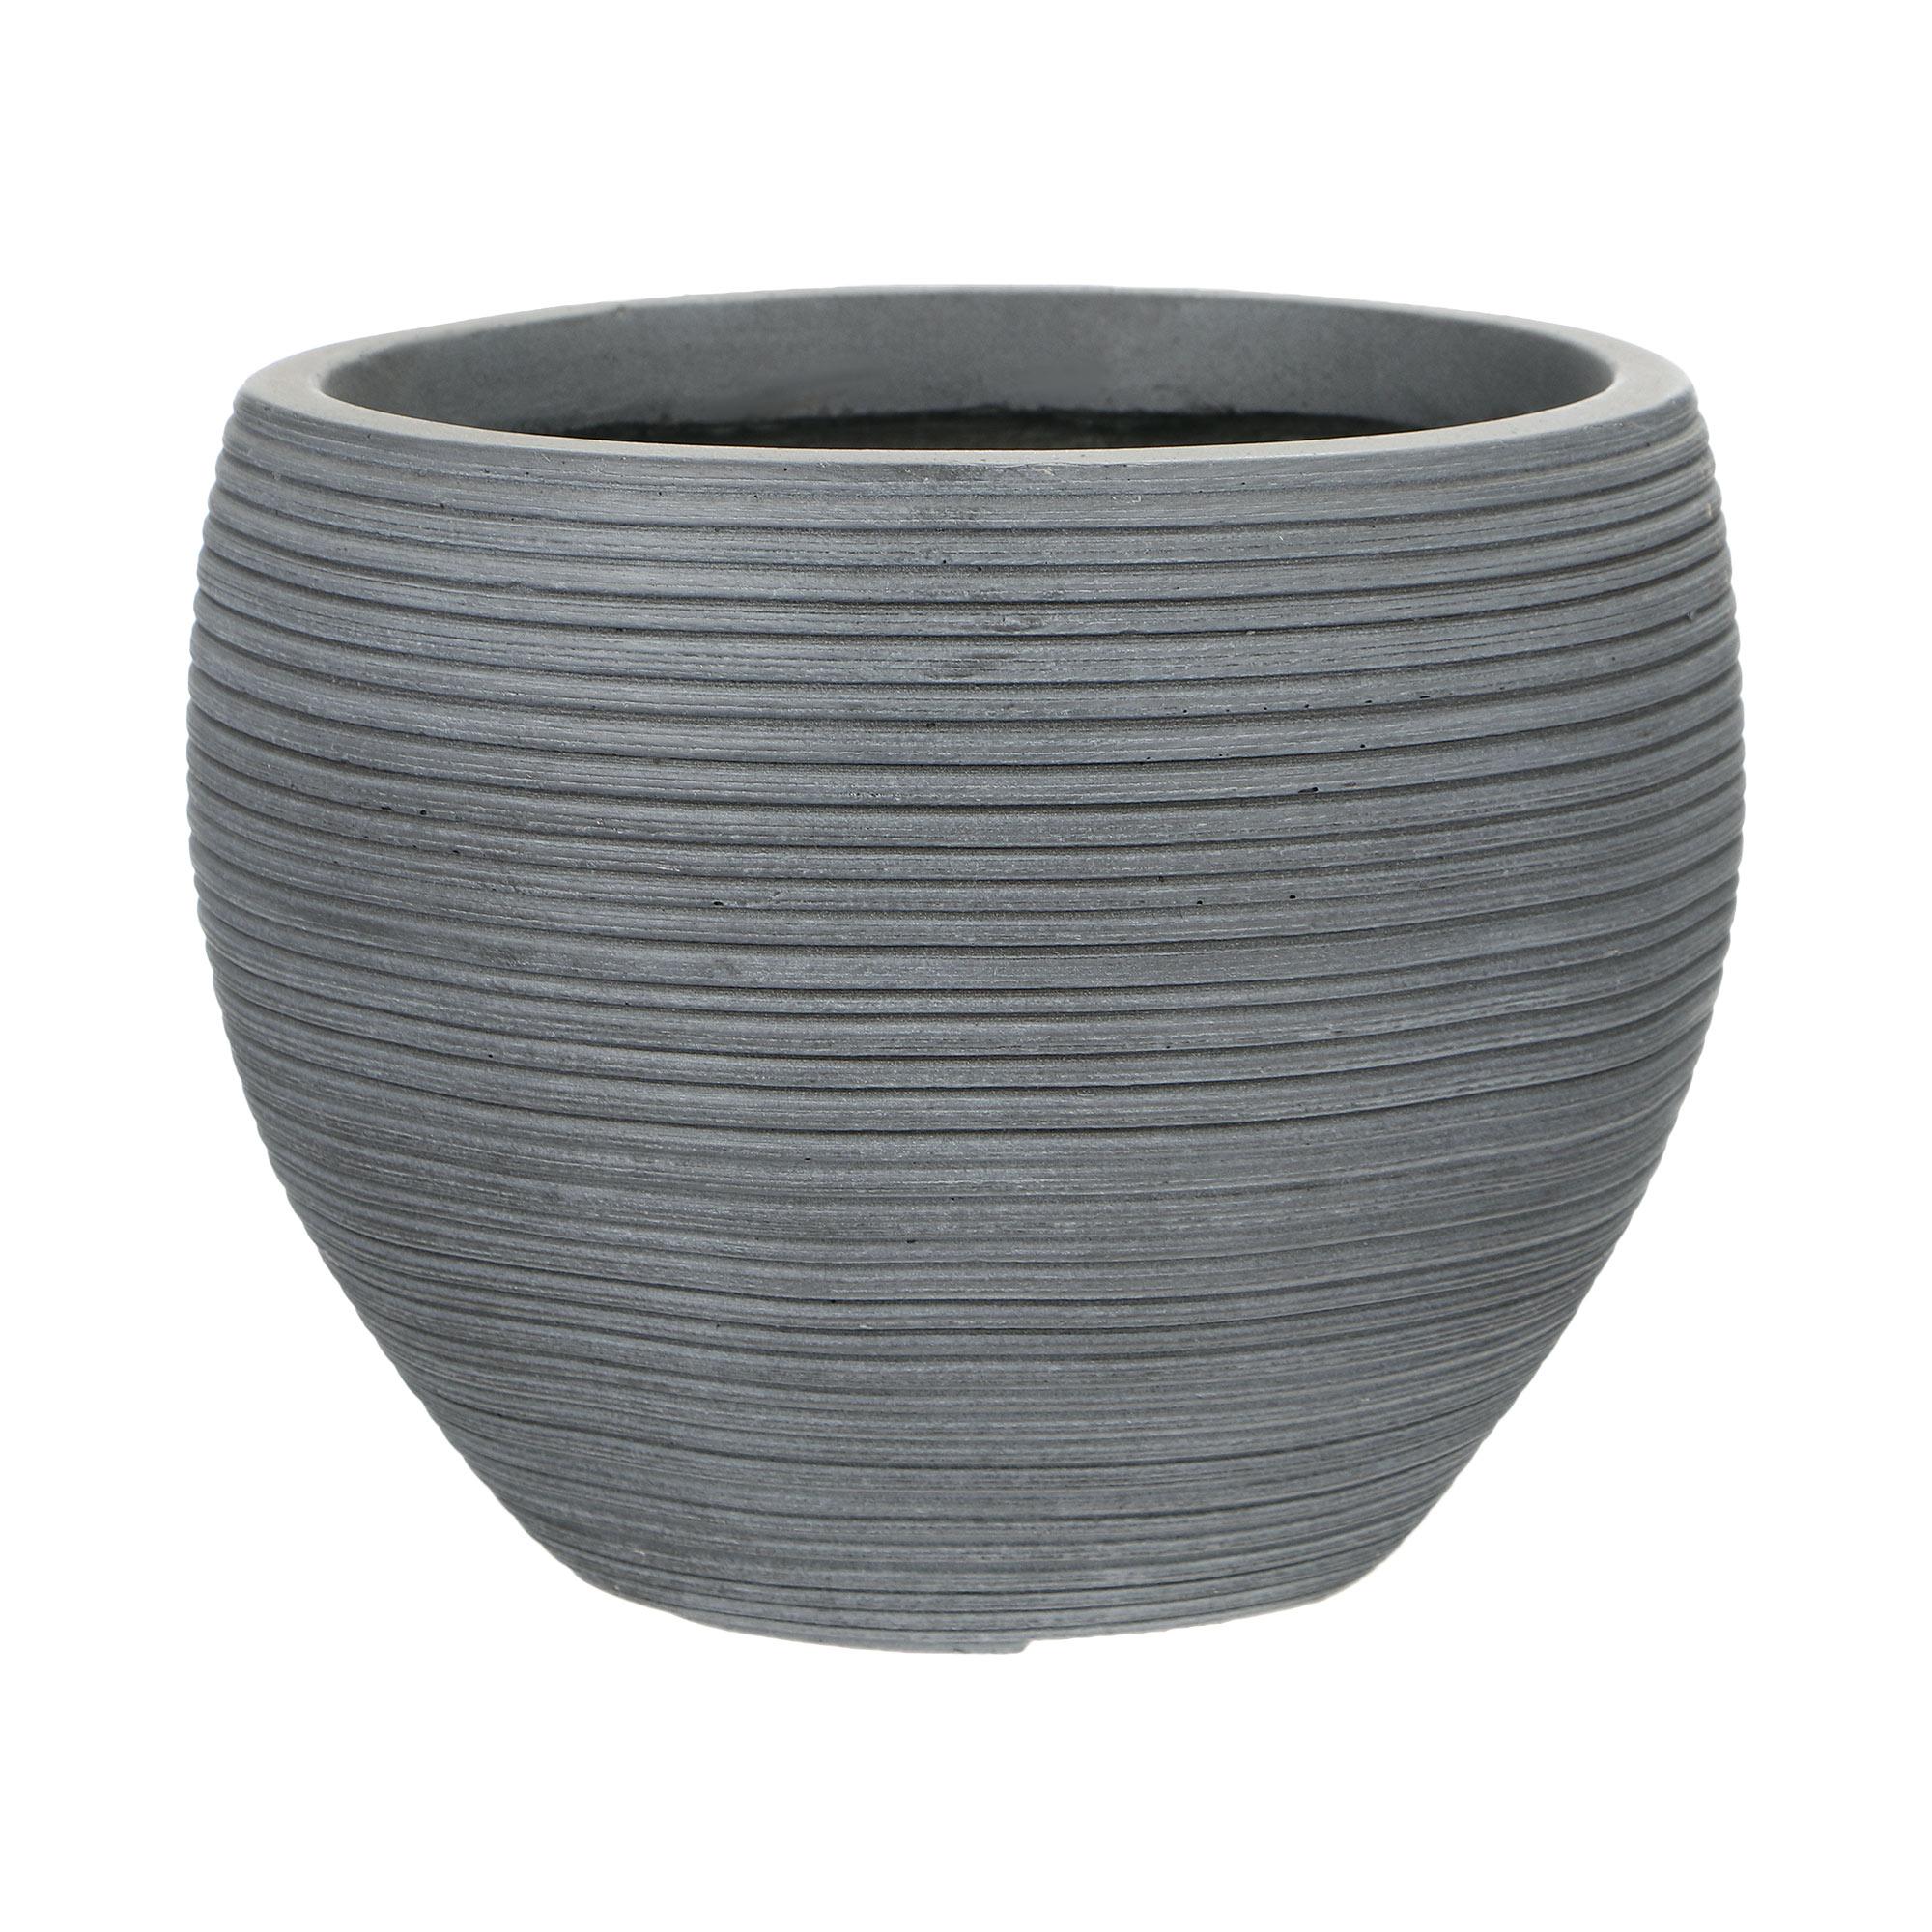 Горшок для цветов L&t pottery темно-серый d49.5